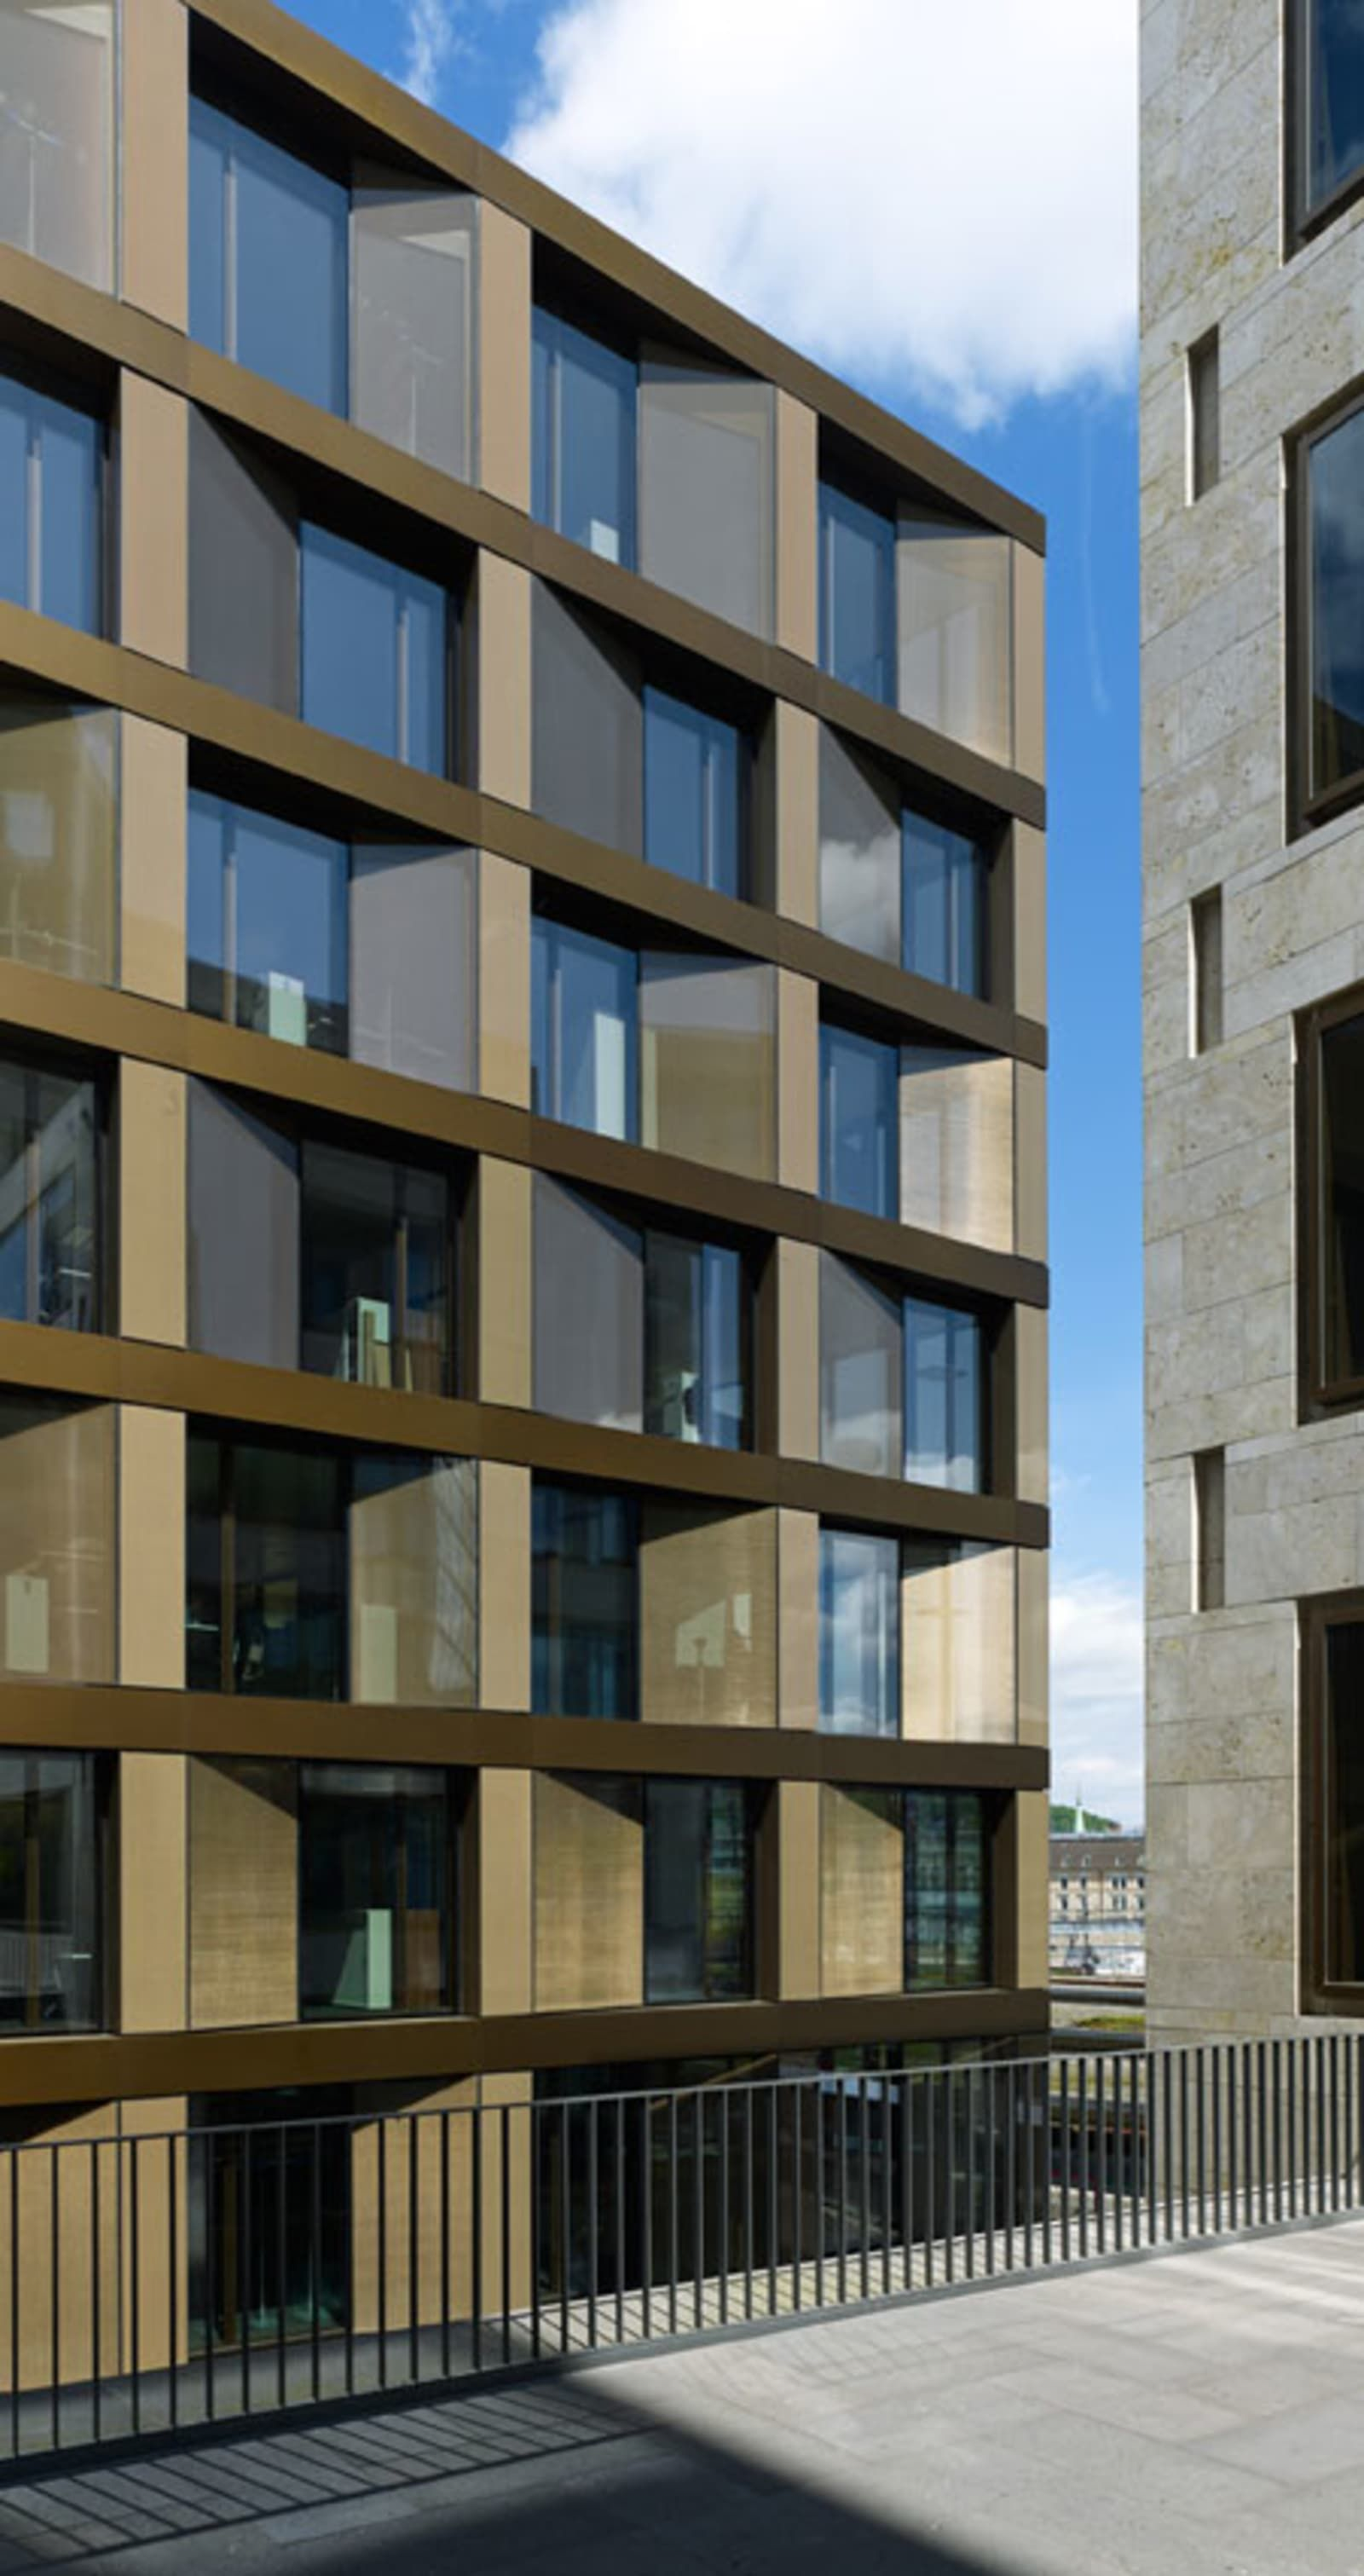 david chipperfield architects  stefan m u00fcller  u00b7 europaallee 21  freisch u00fctzgasse house